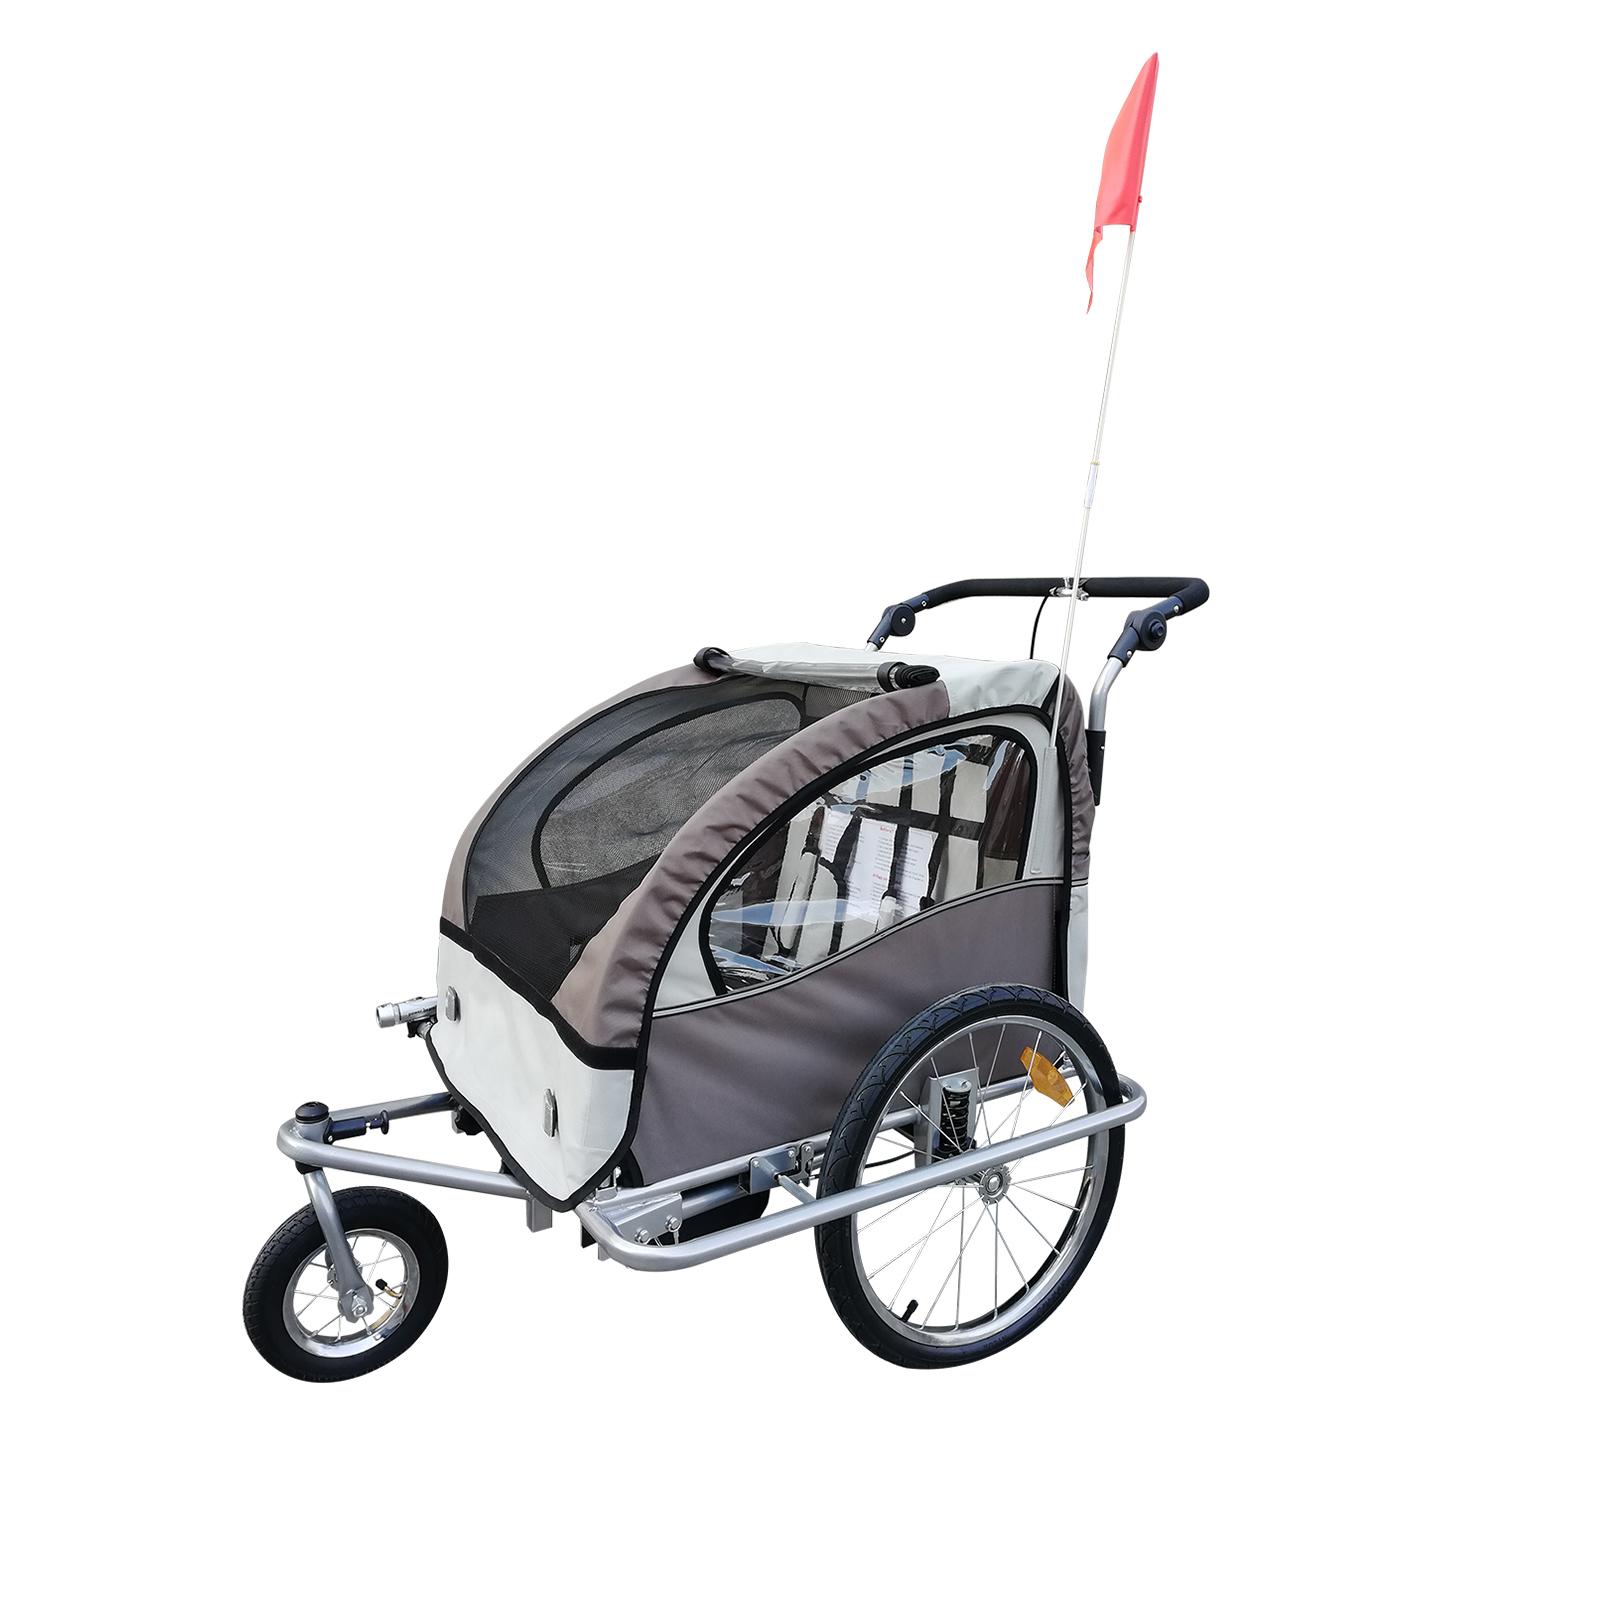 Remolque-Infantil-Bicicleta-2-PLAZAS-Kit-Footing-Rueda-360-Amortiguadores-Barra miniatura 25